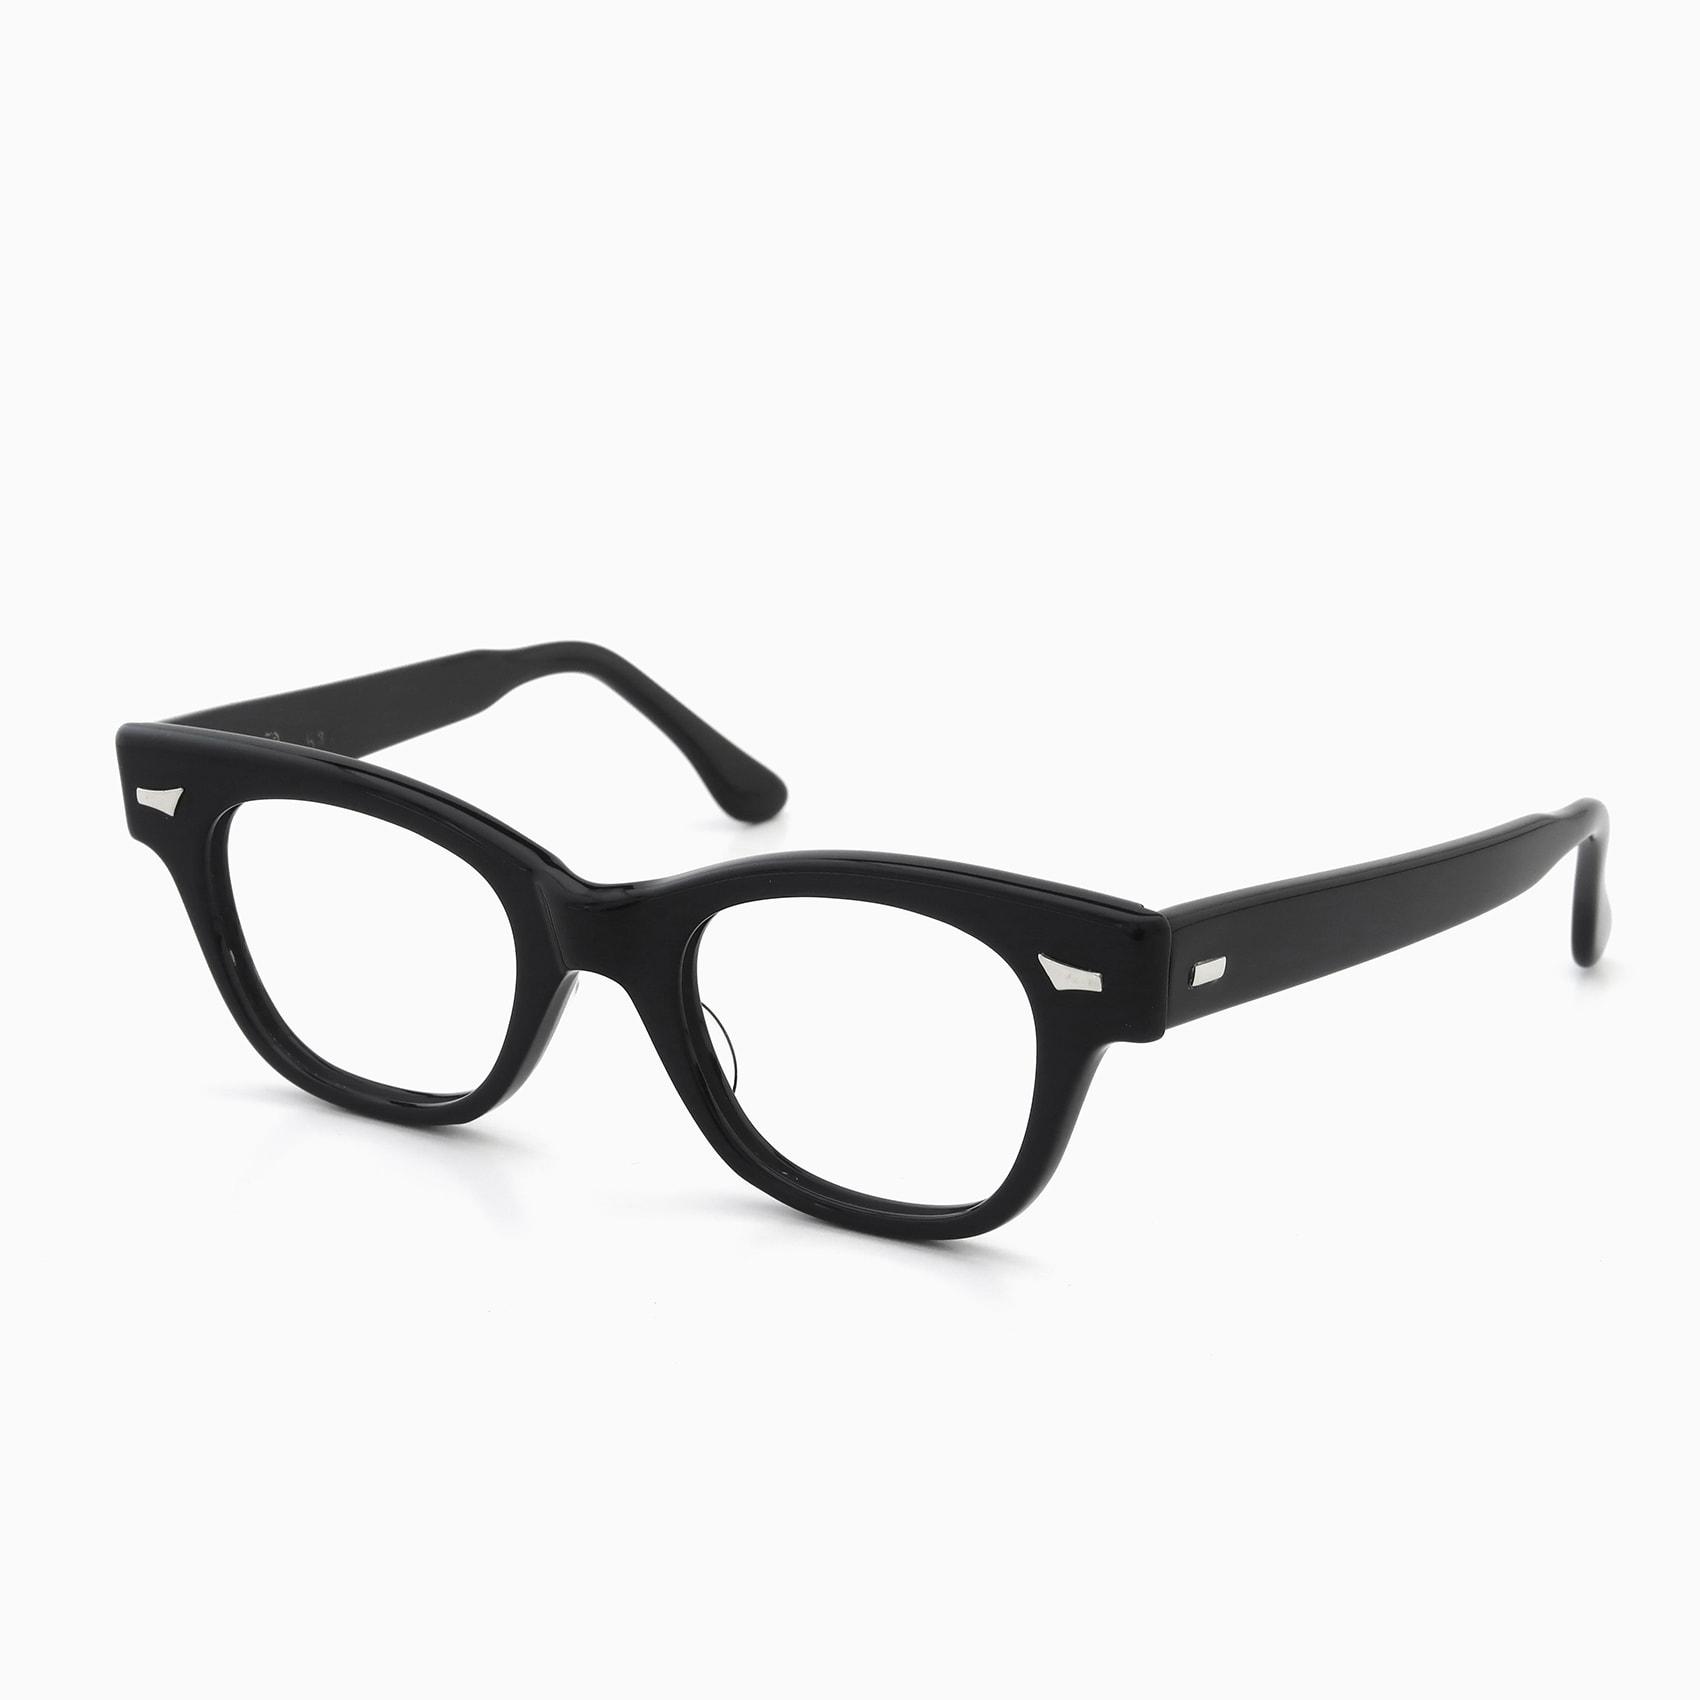 Tart-OPTICAL-vintage_COUNTDOWN_BLACK_AX_44-20_V2_4